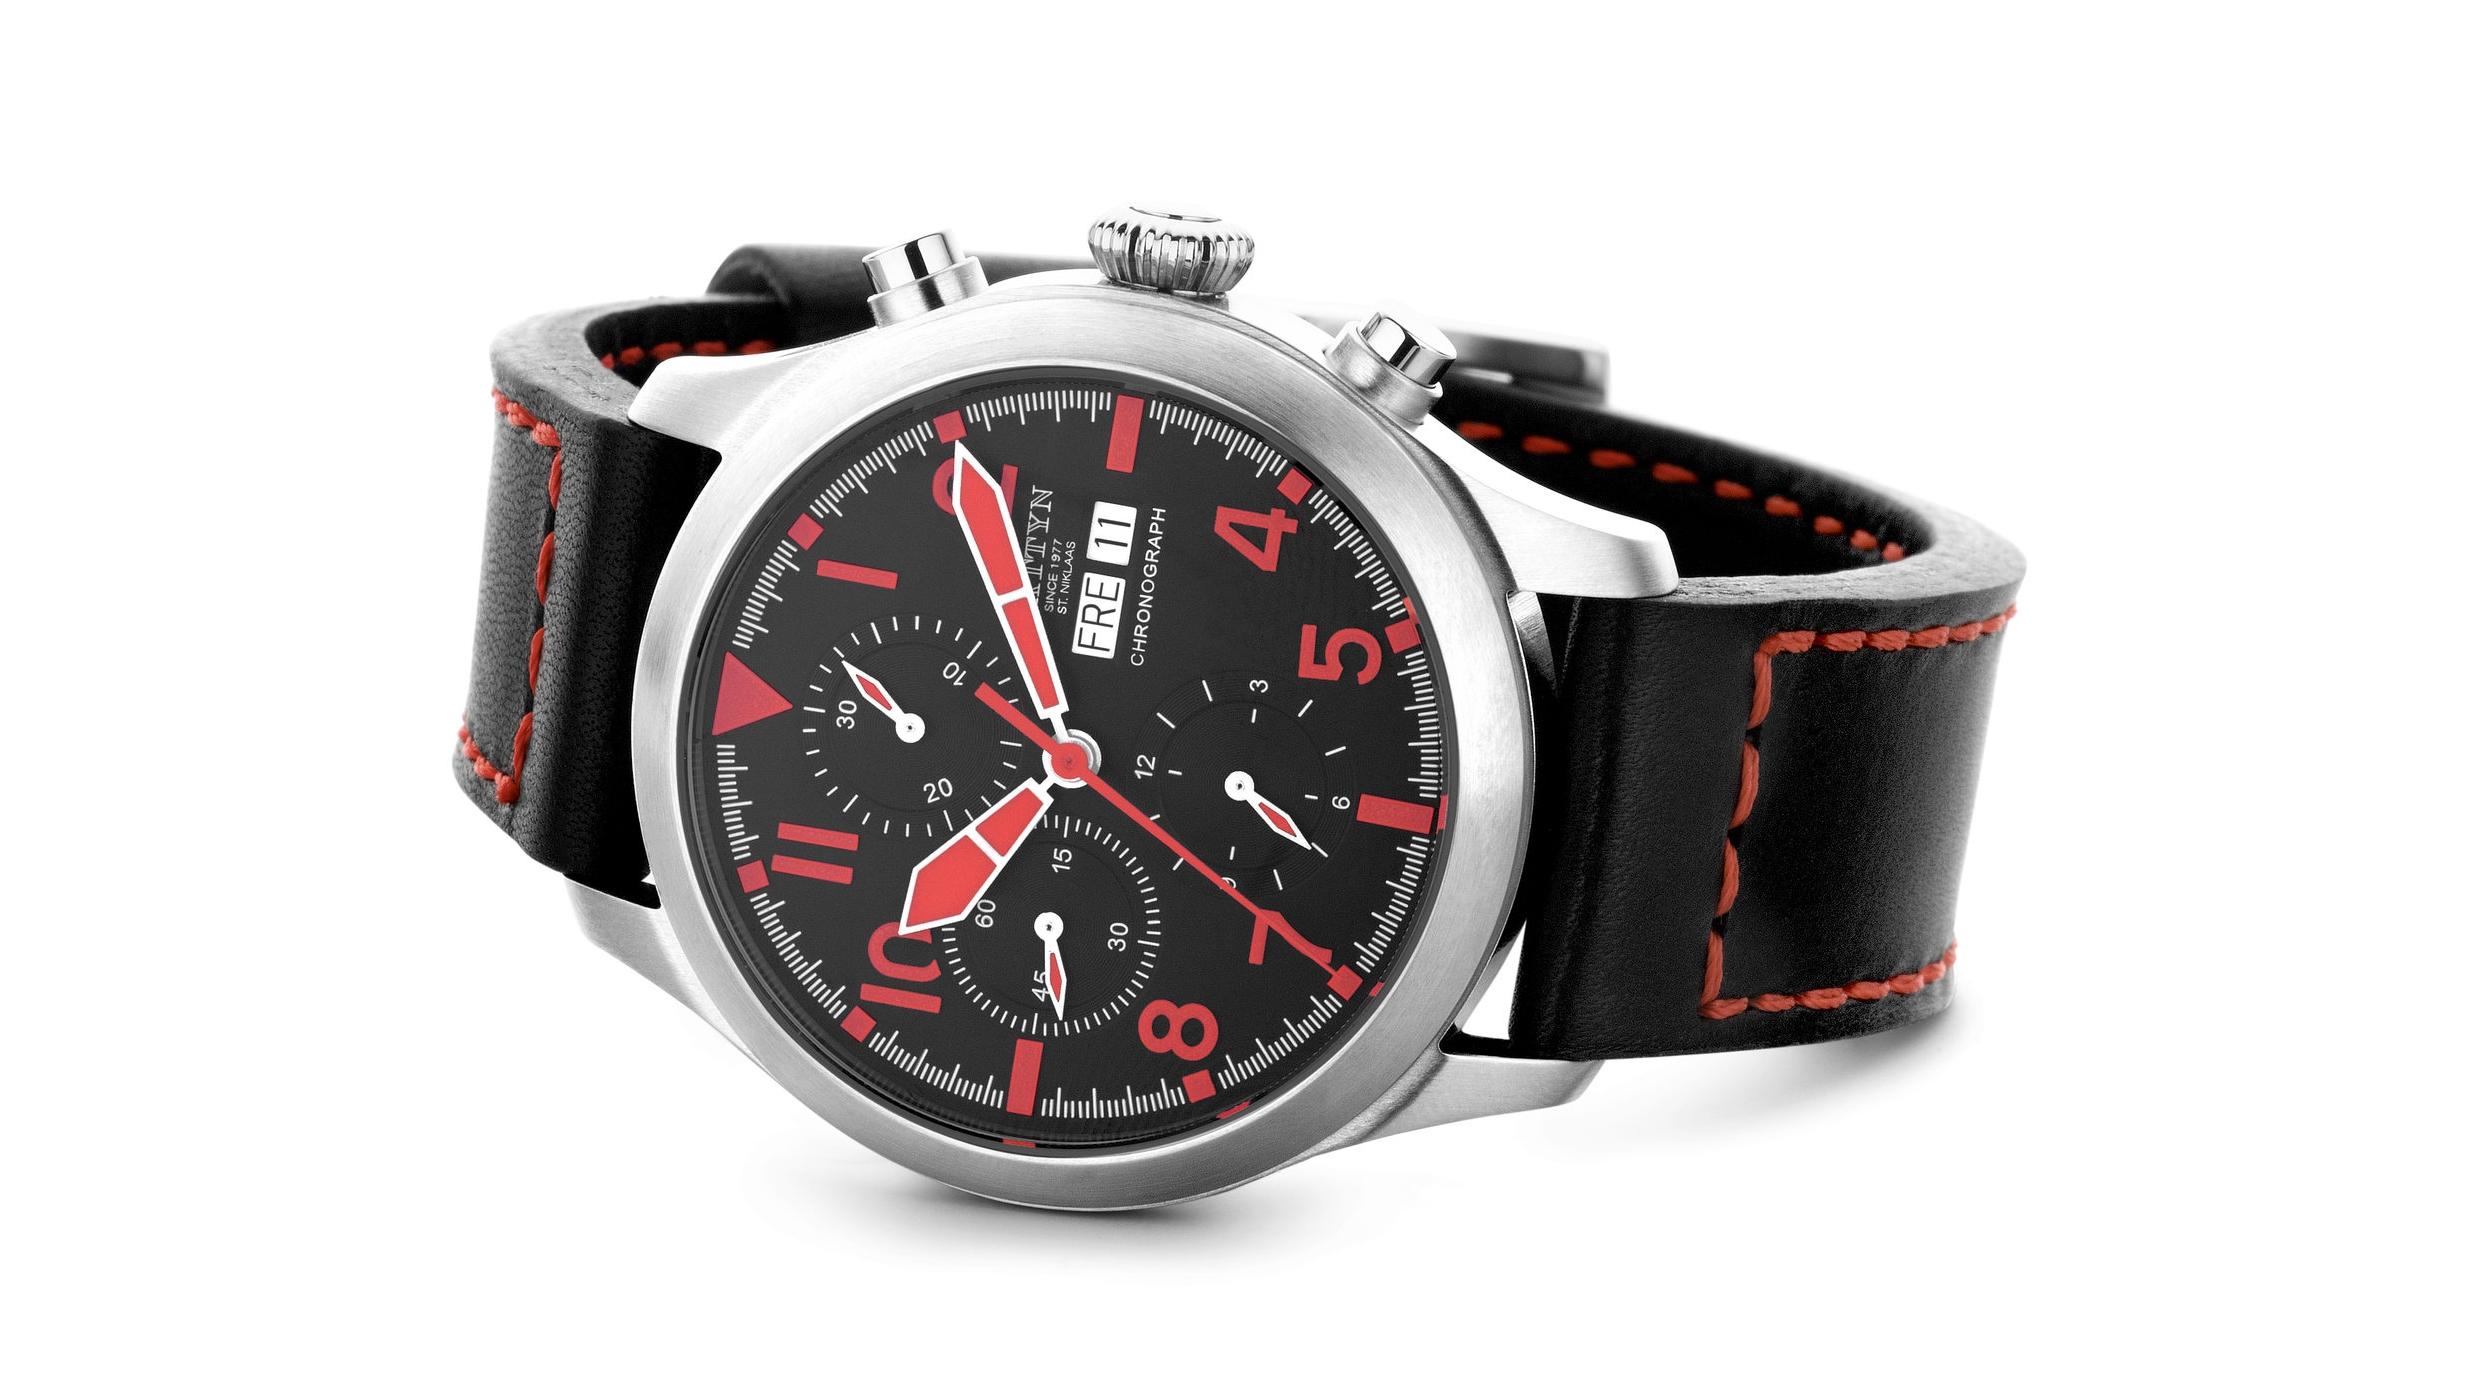 Automatisch chronograaf